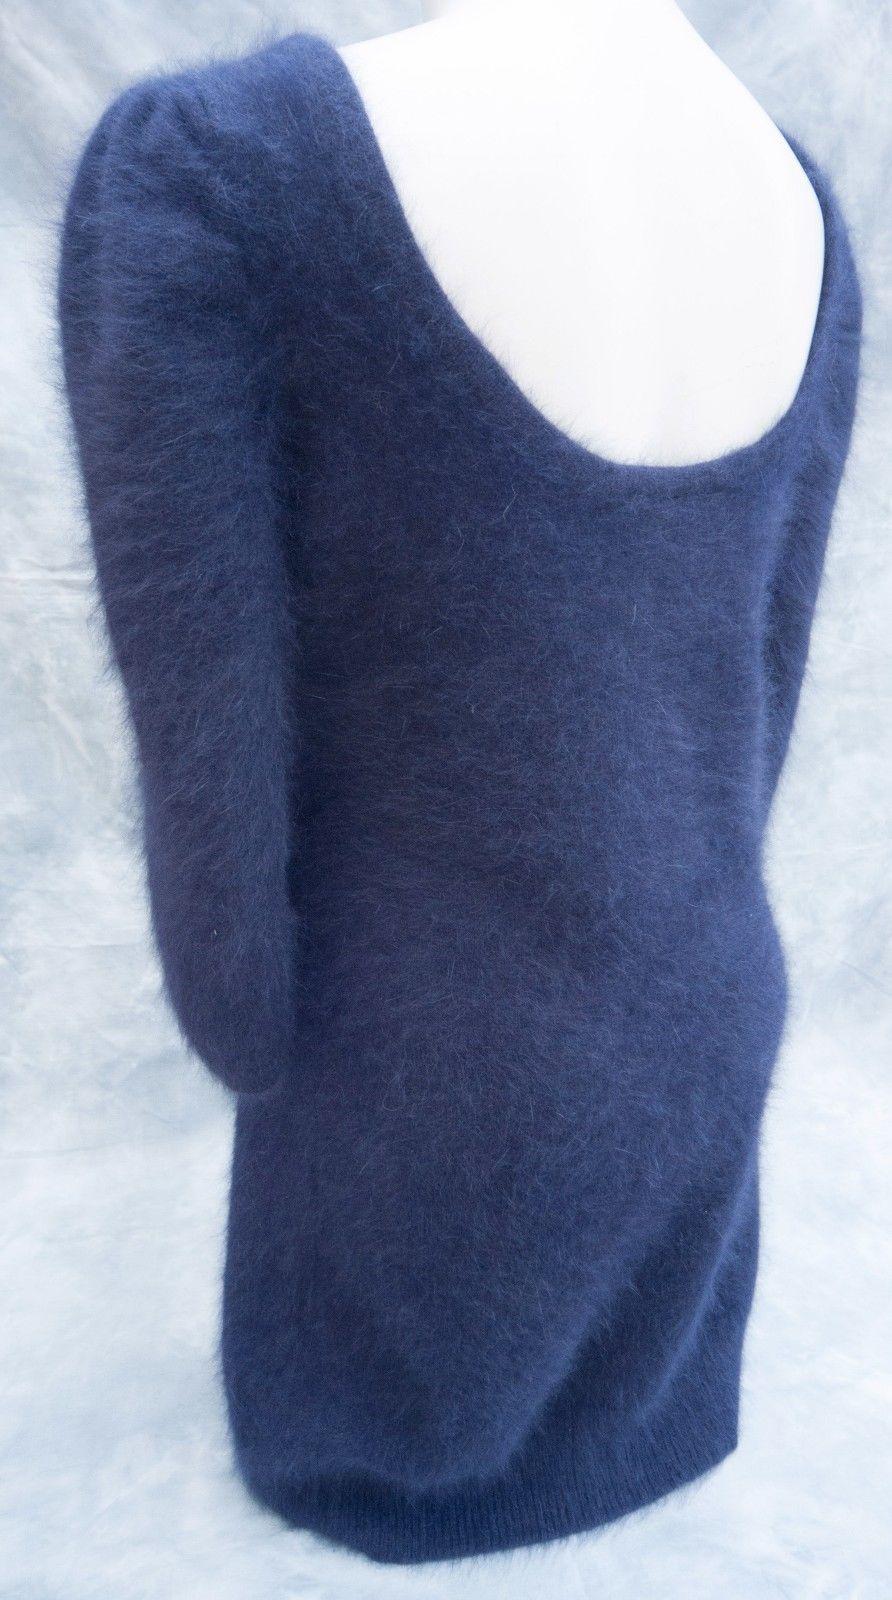 67806651_dress-by-warehouse-gs-5.jpg